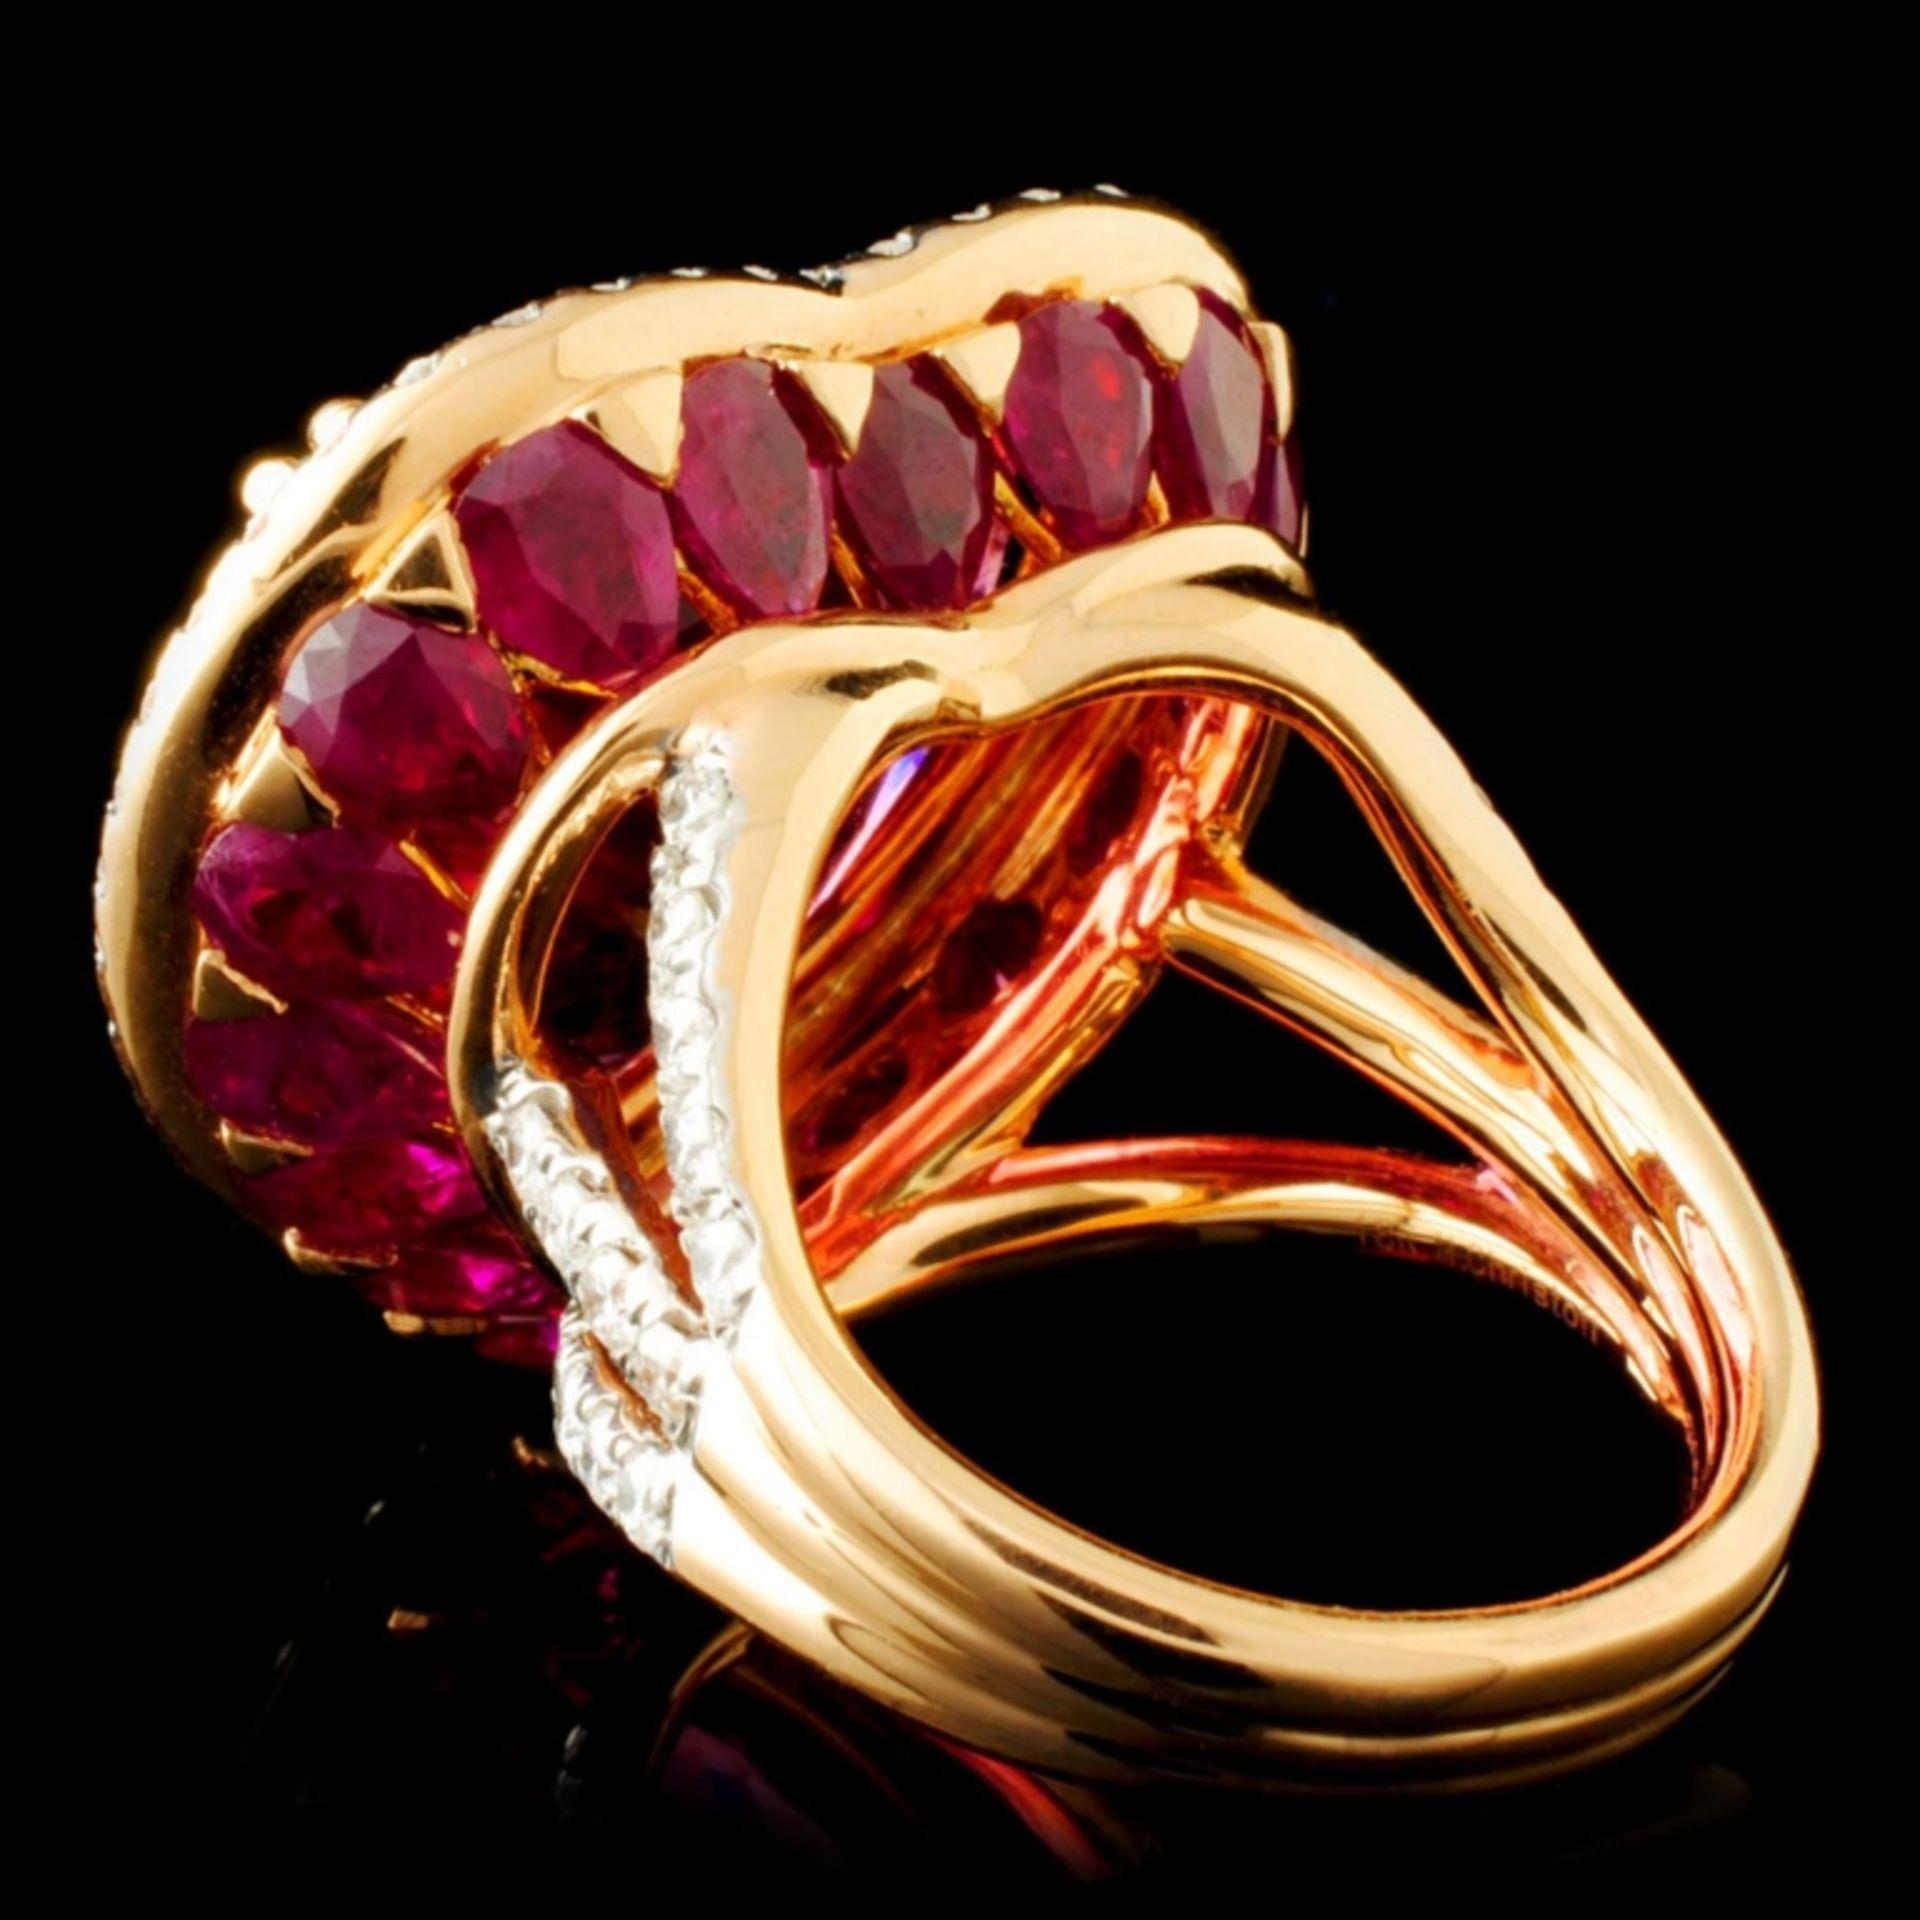 18K Gold 16.47ct Rubellite & 1.76ctw Diamond Ring - Image 4 of 6